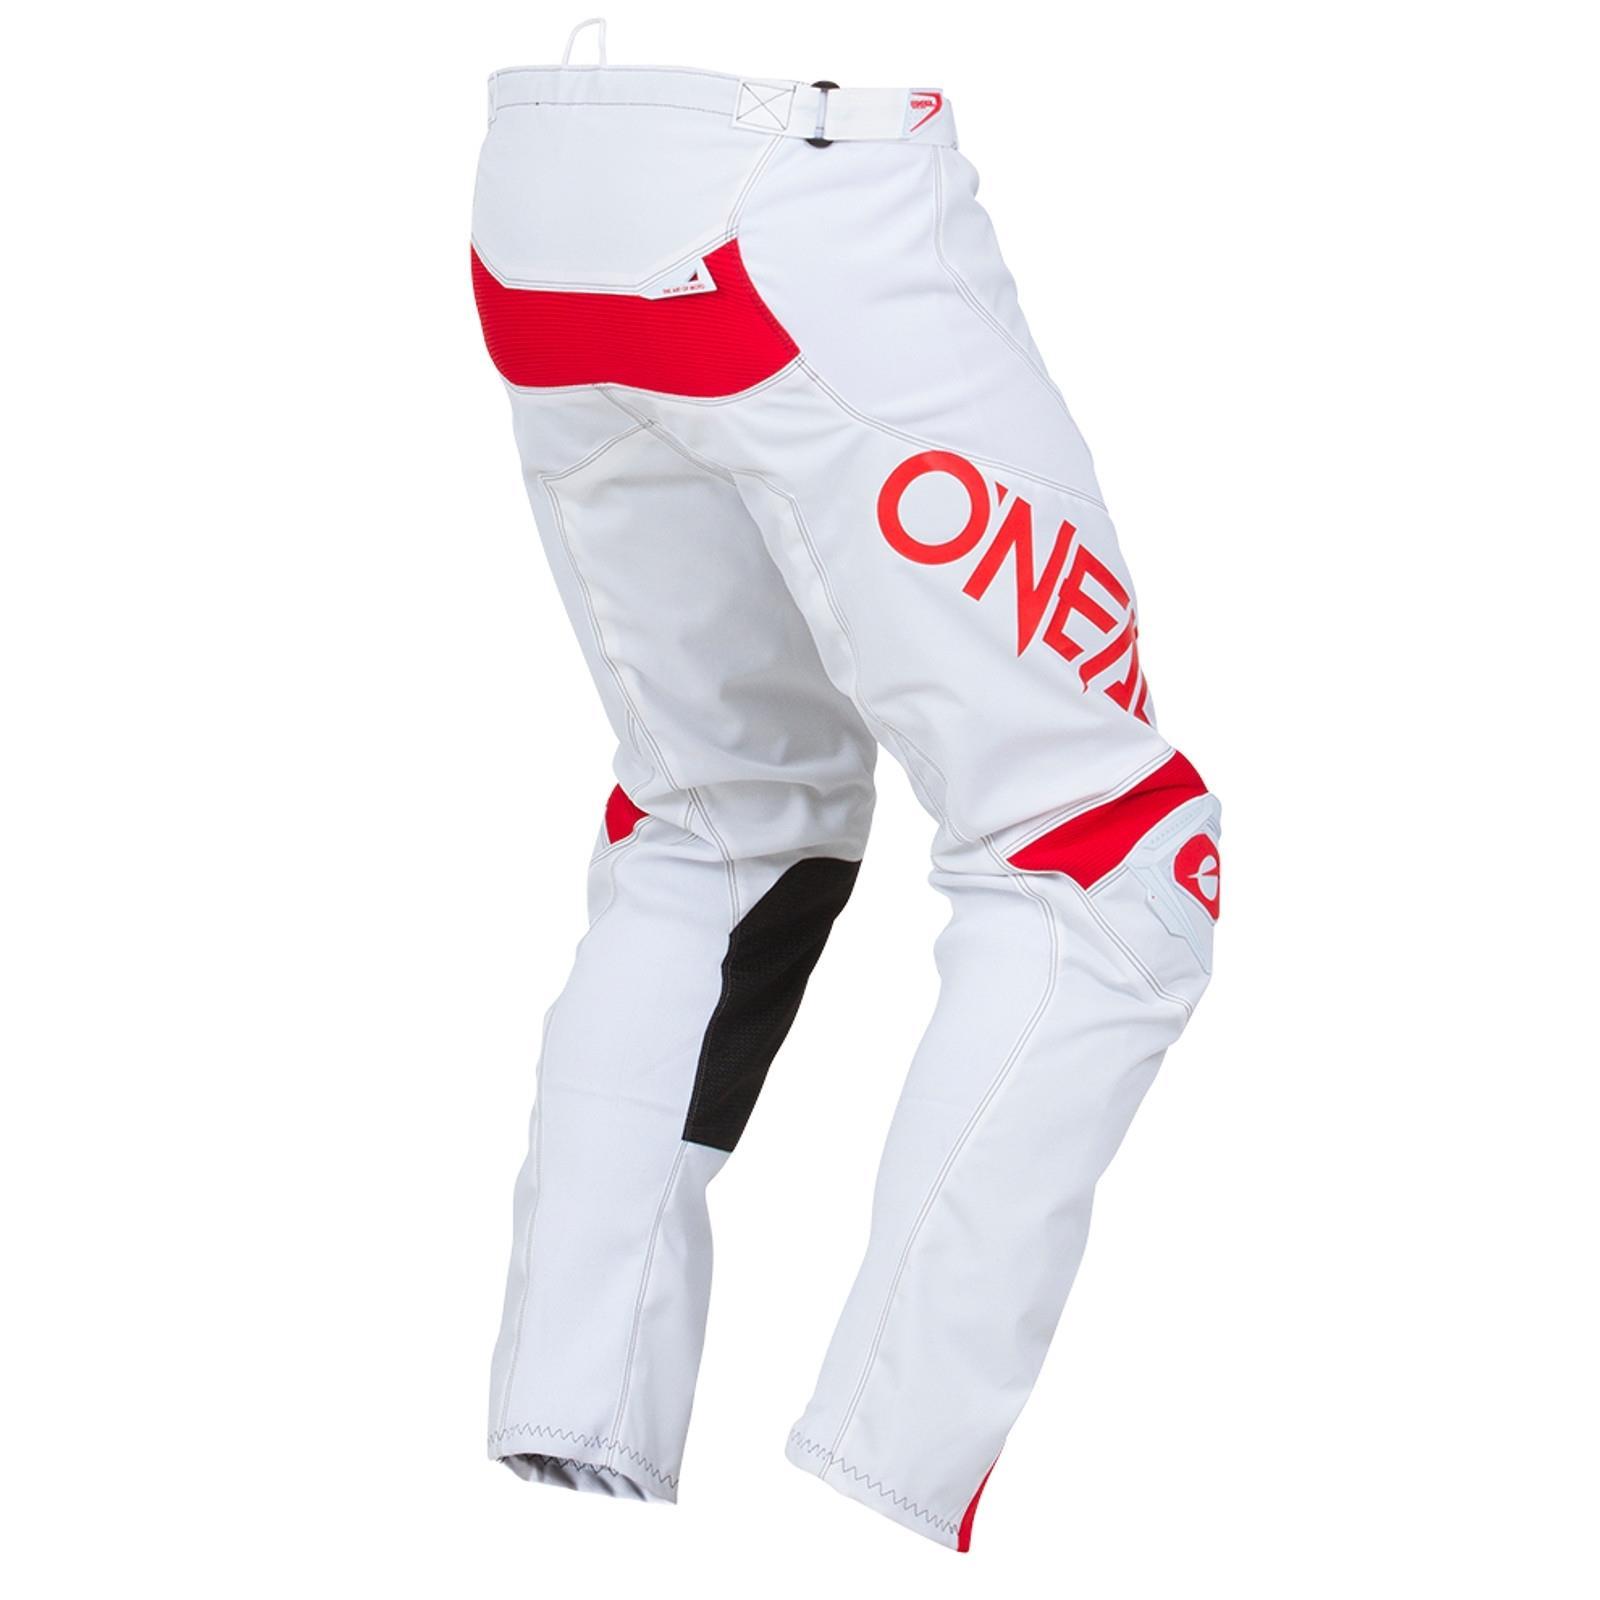 Oneal-elemento-Mayhem-Hardwear-Pants-pantalones-MX-DH-FR-Moto-Cross-Enduro-MTB-moto miniatura 61